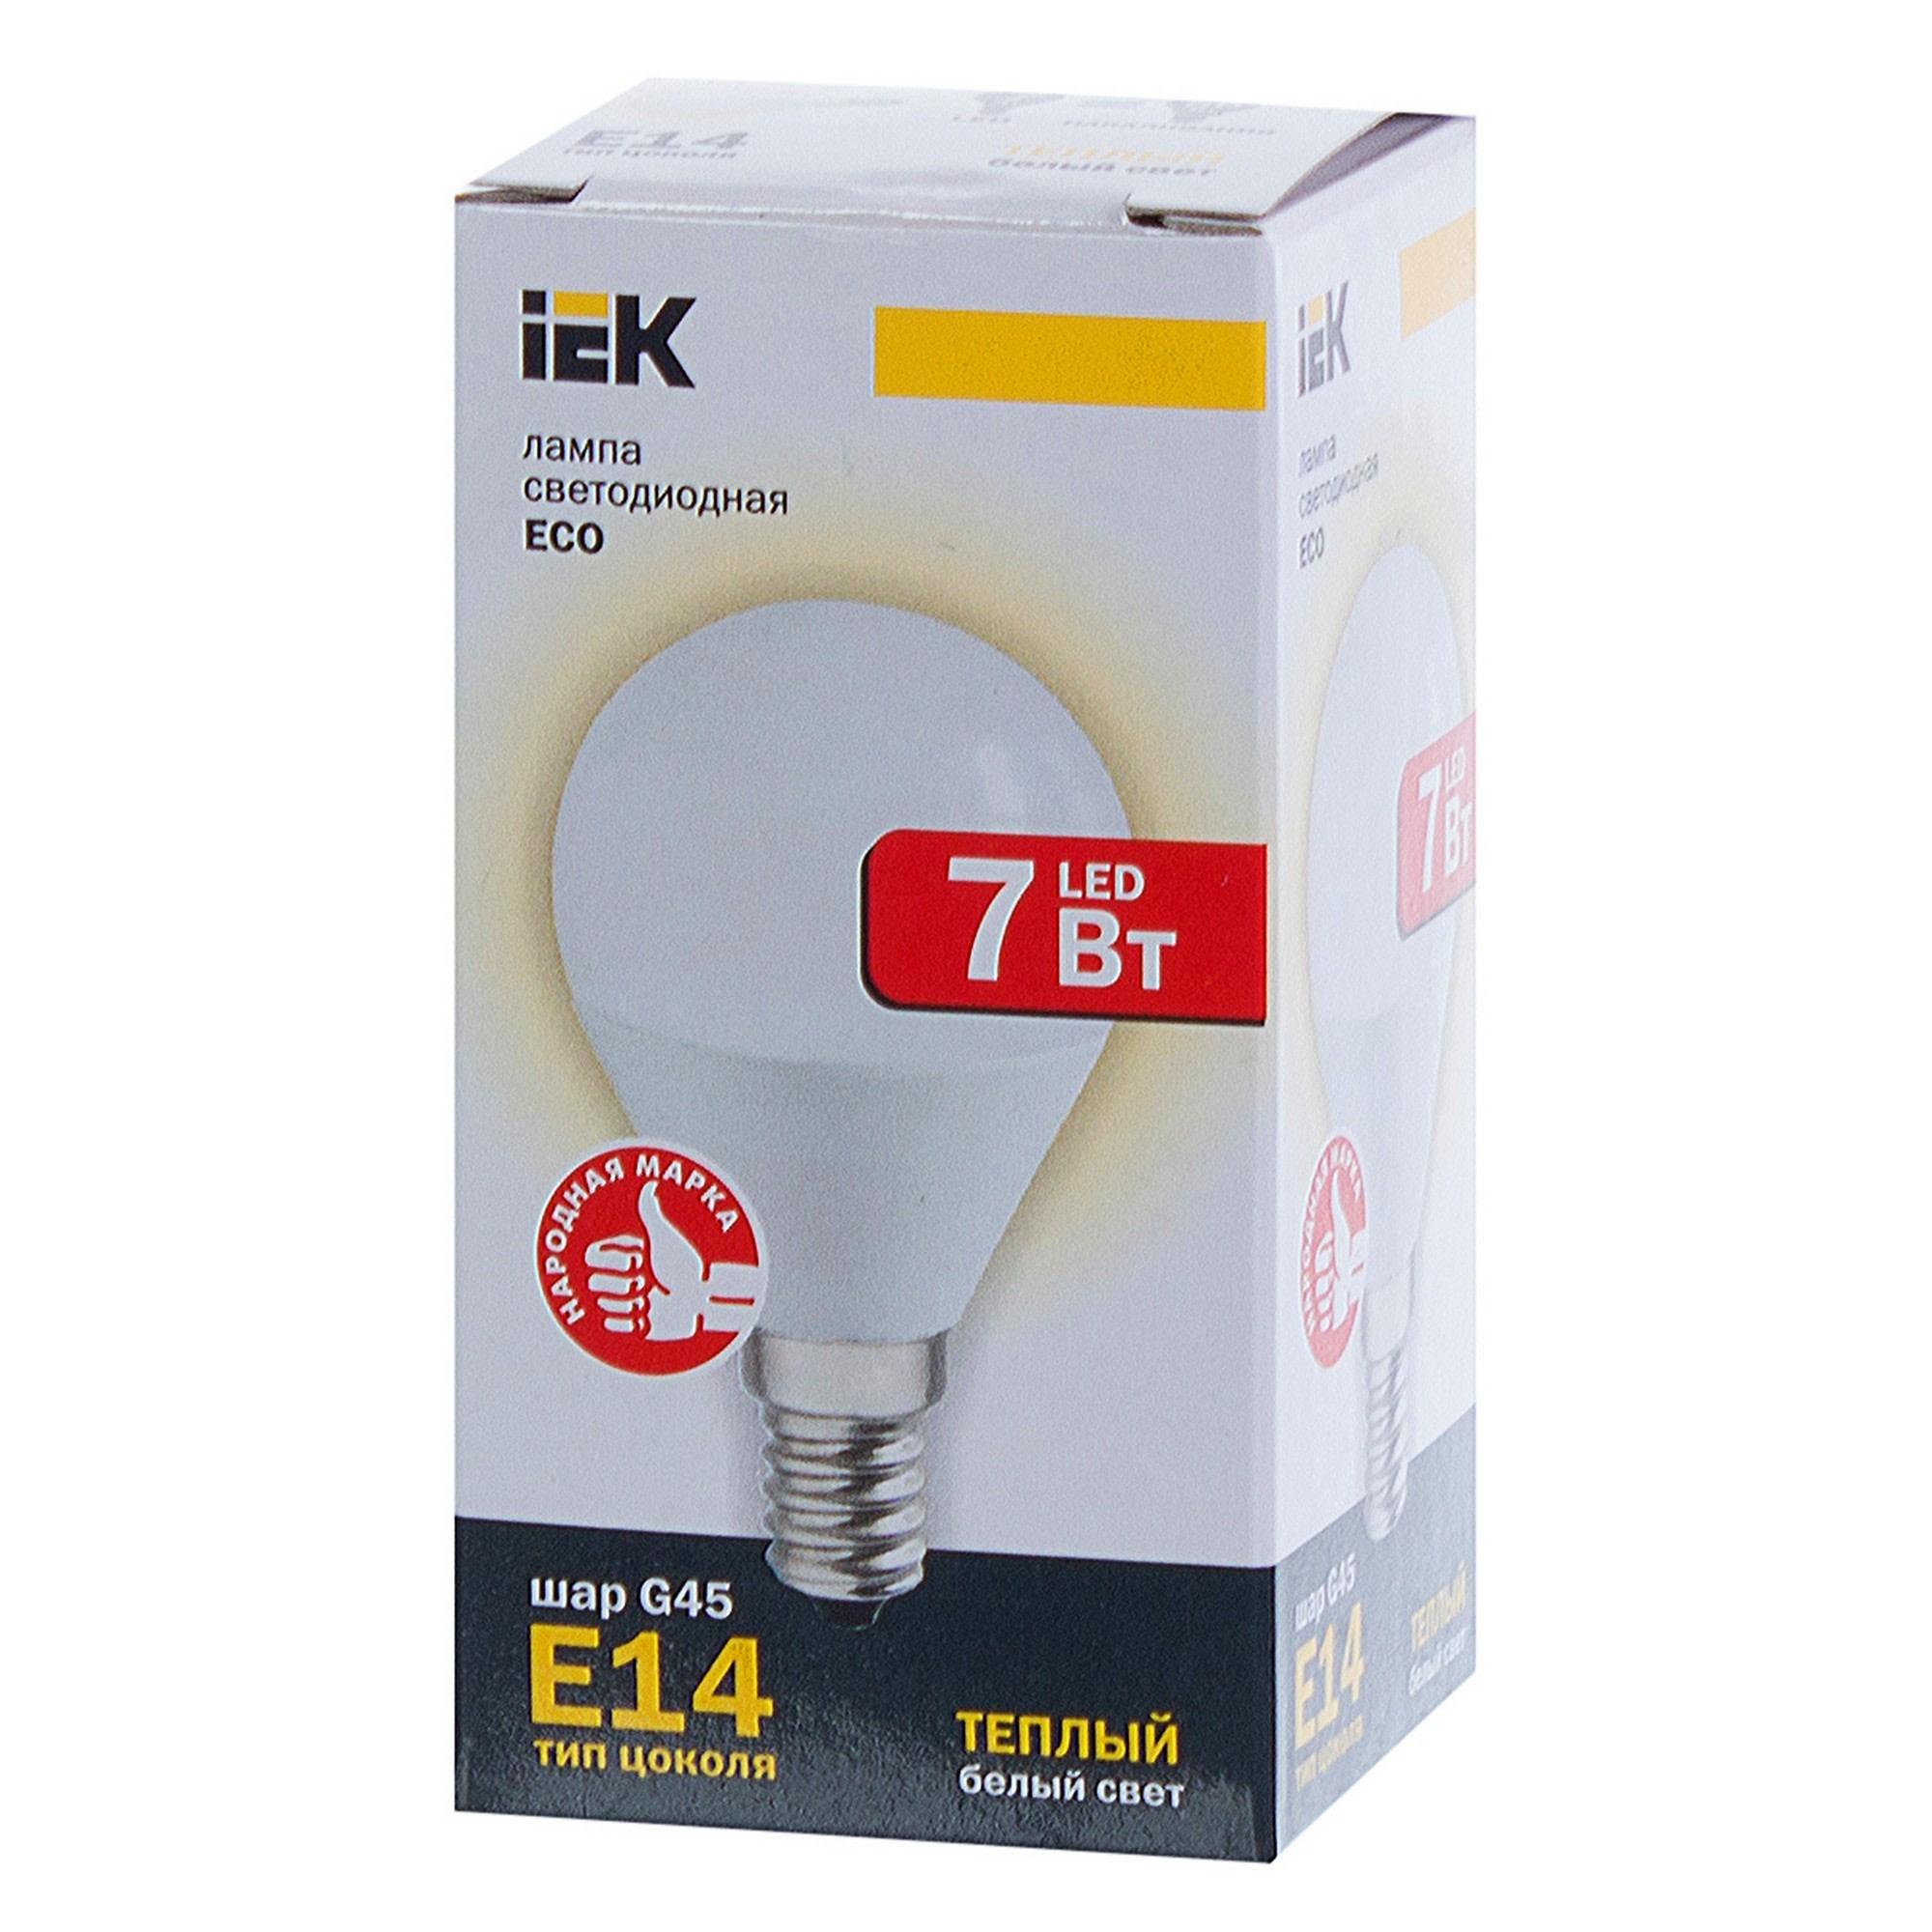 Лампа светодиодная IEK G45 Шар E14 7 Вт 3000К свет тёплый белый